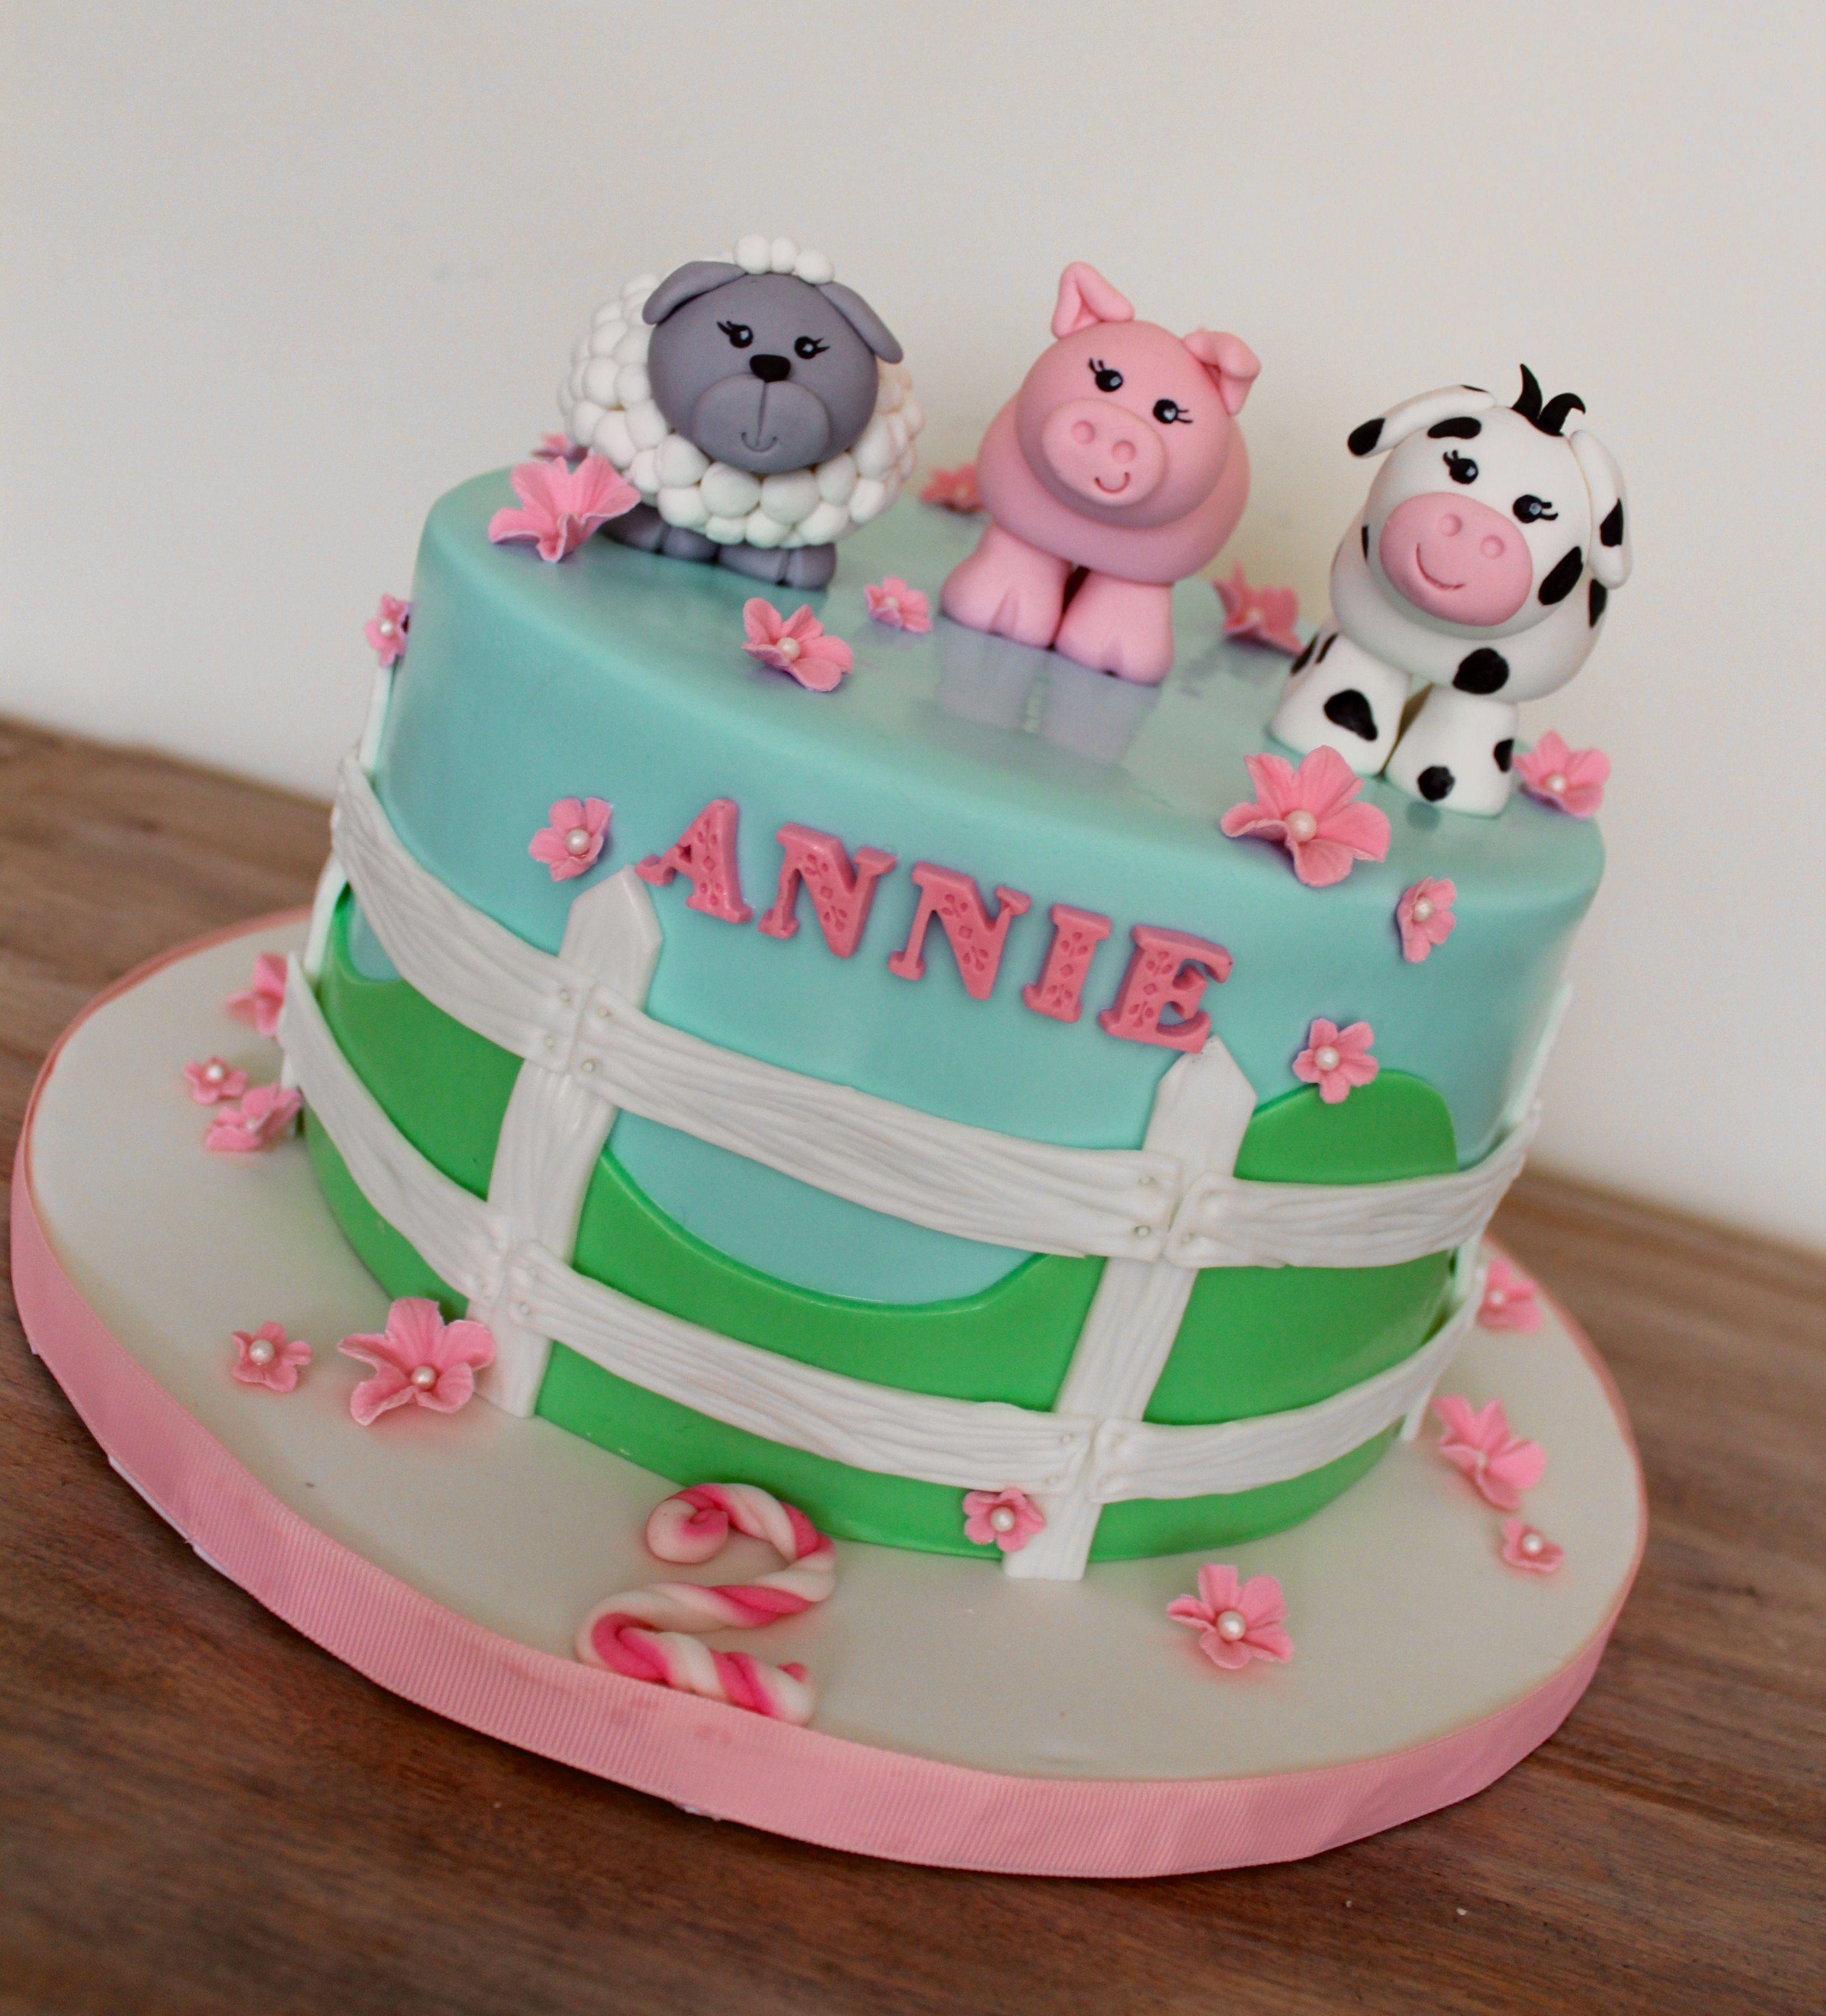 Farm Animals Fondant Sheep Pig Cow Figurine Edible Birthday Cake